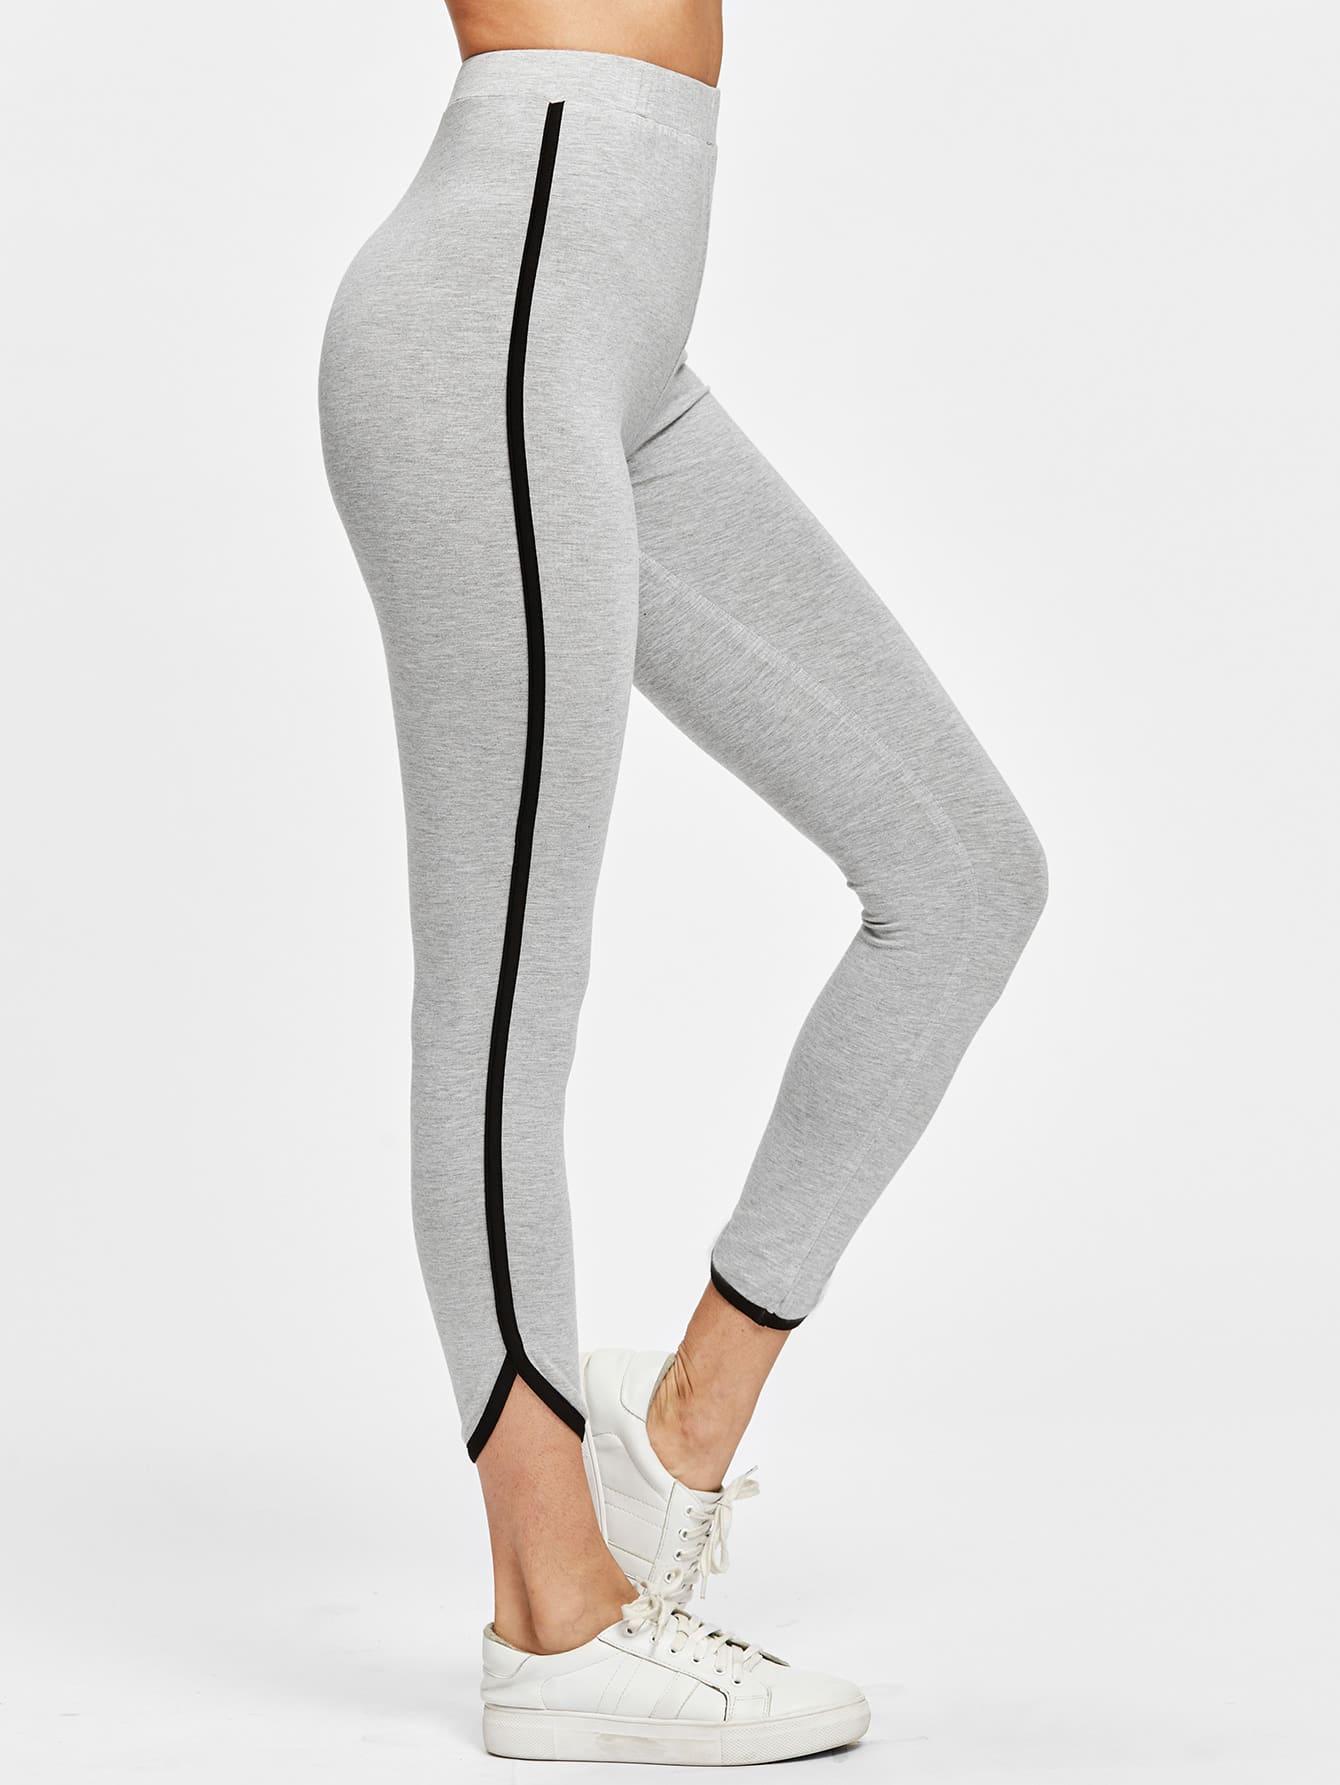 Contrast Binding Curved Hem Heather Knit Leggings contrast ruffle trim heather knit sweatshirt